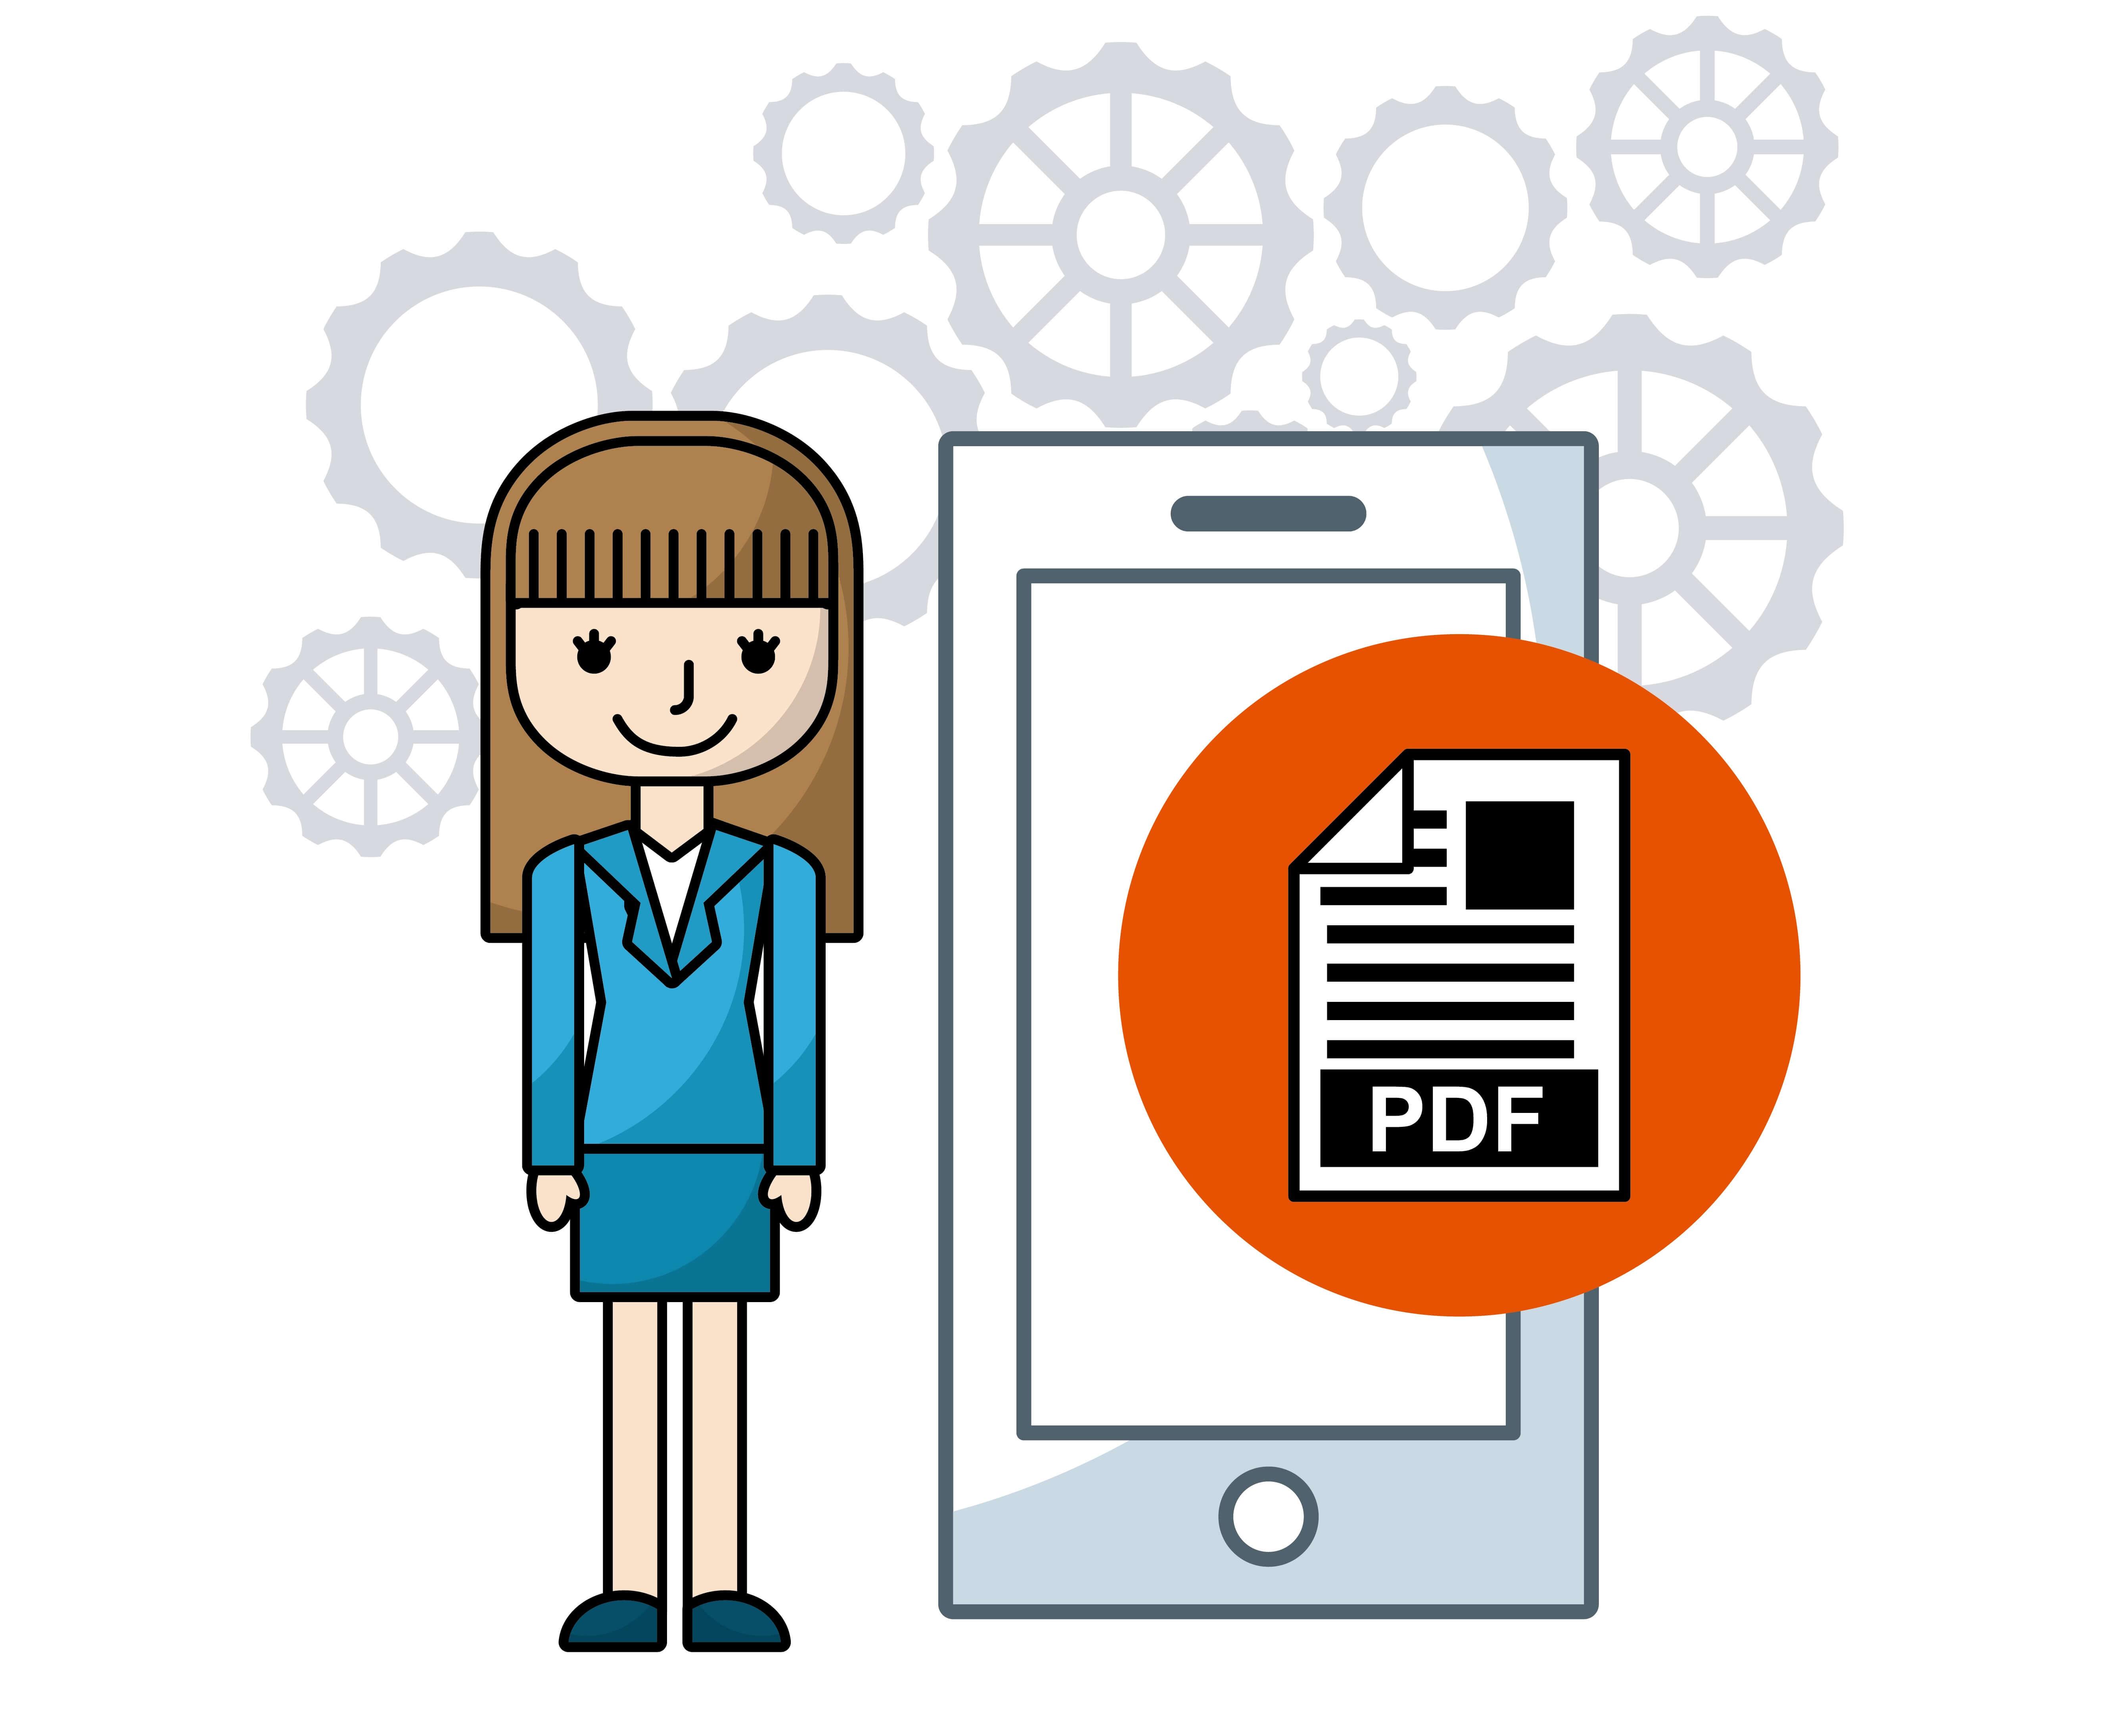 sign-pdf-icon